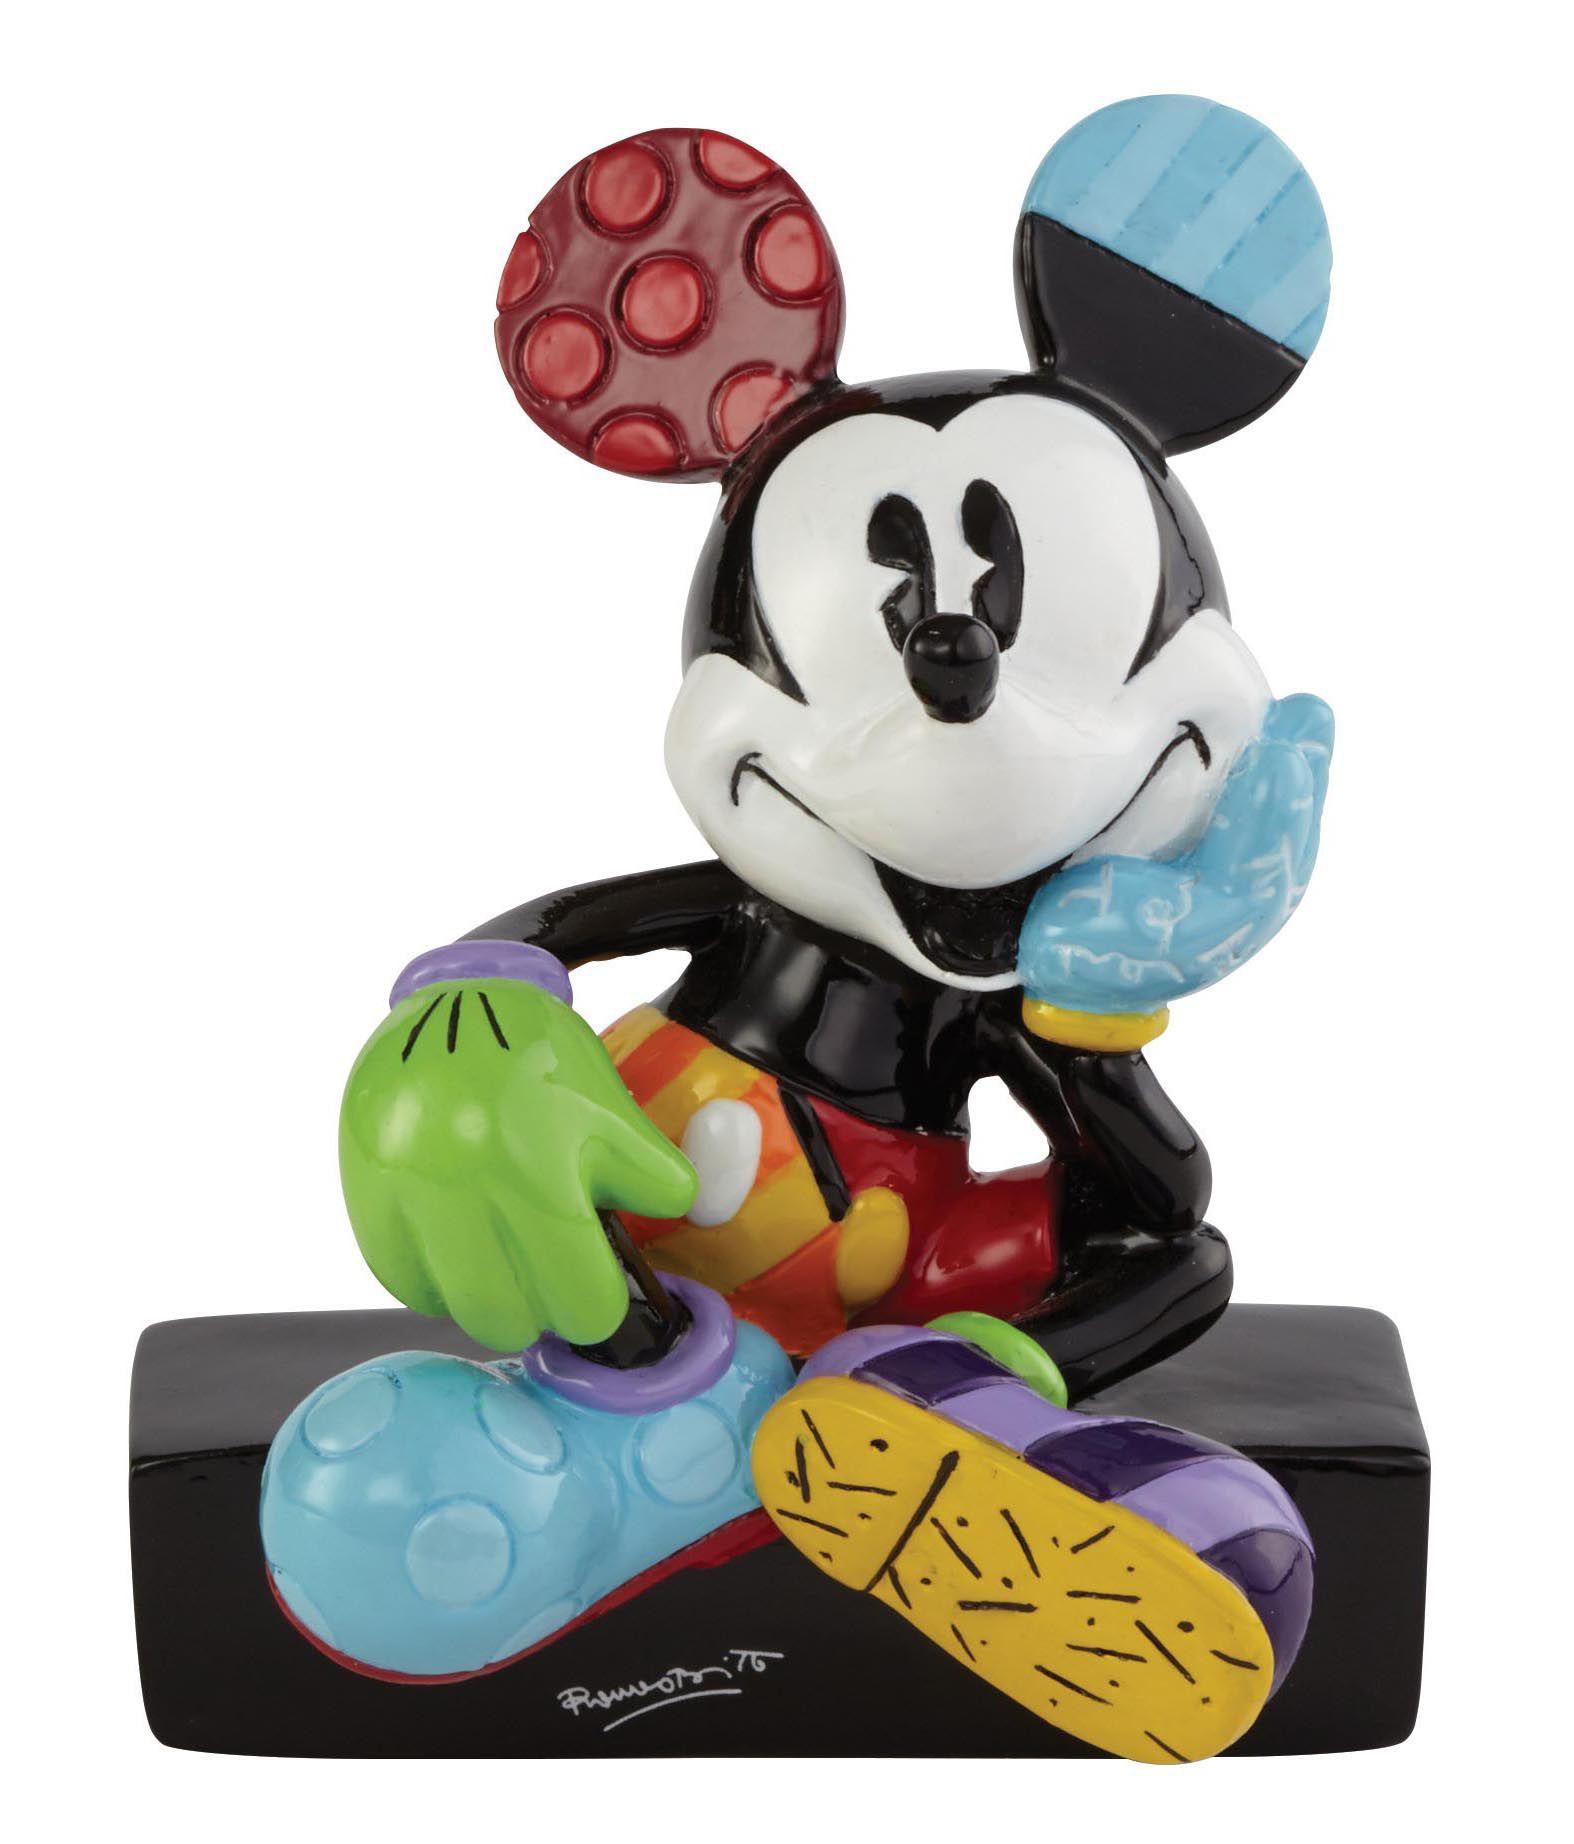 DISNEY BY BRITTO Disney by Britto Figur PopArt sitzend auf Sockel, »Mickey Mouse«